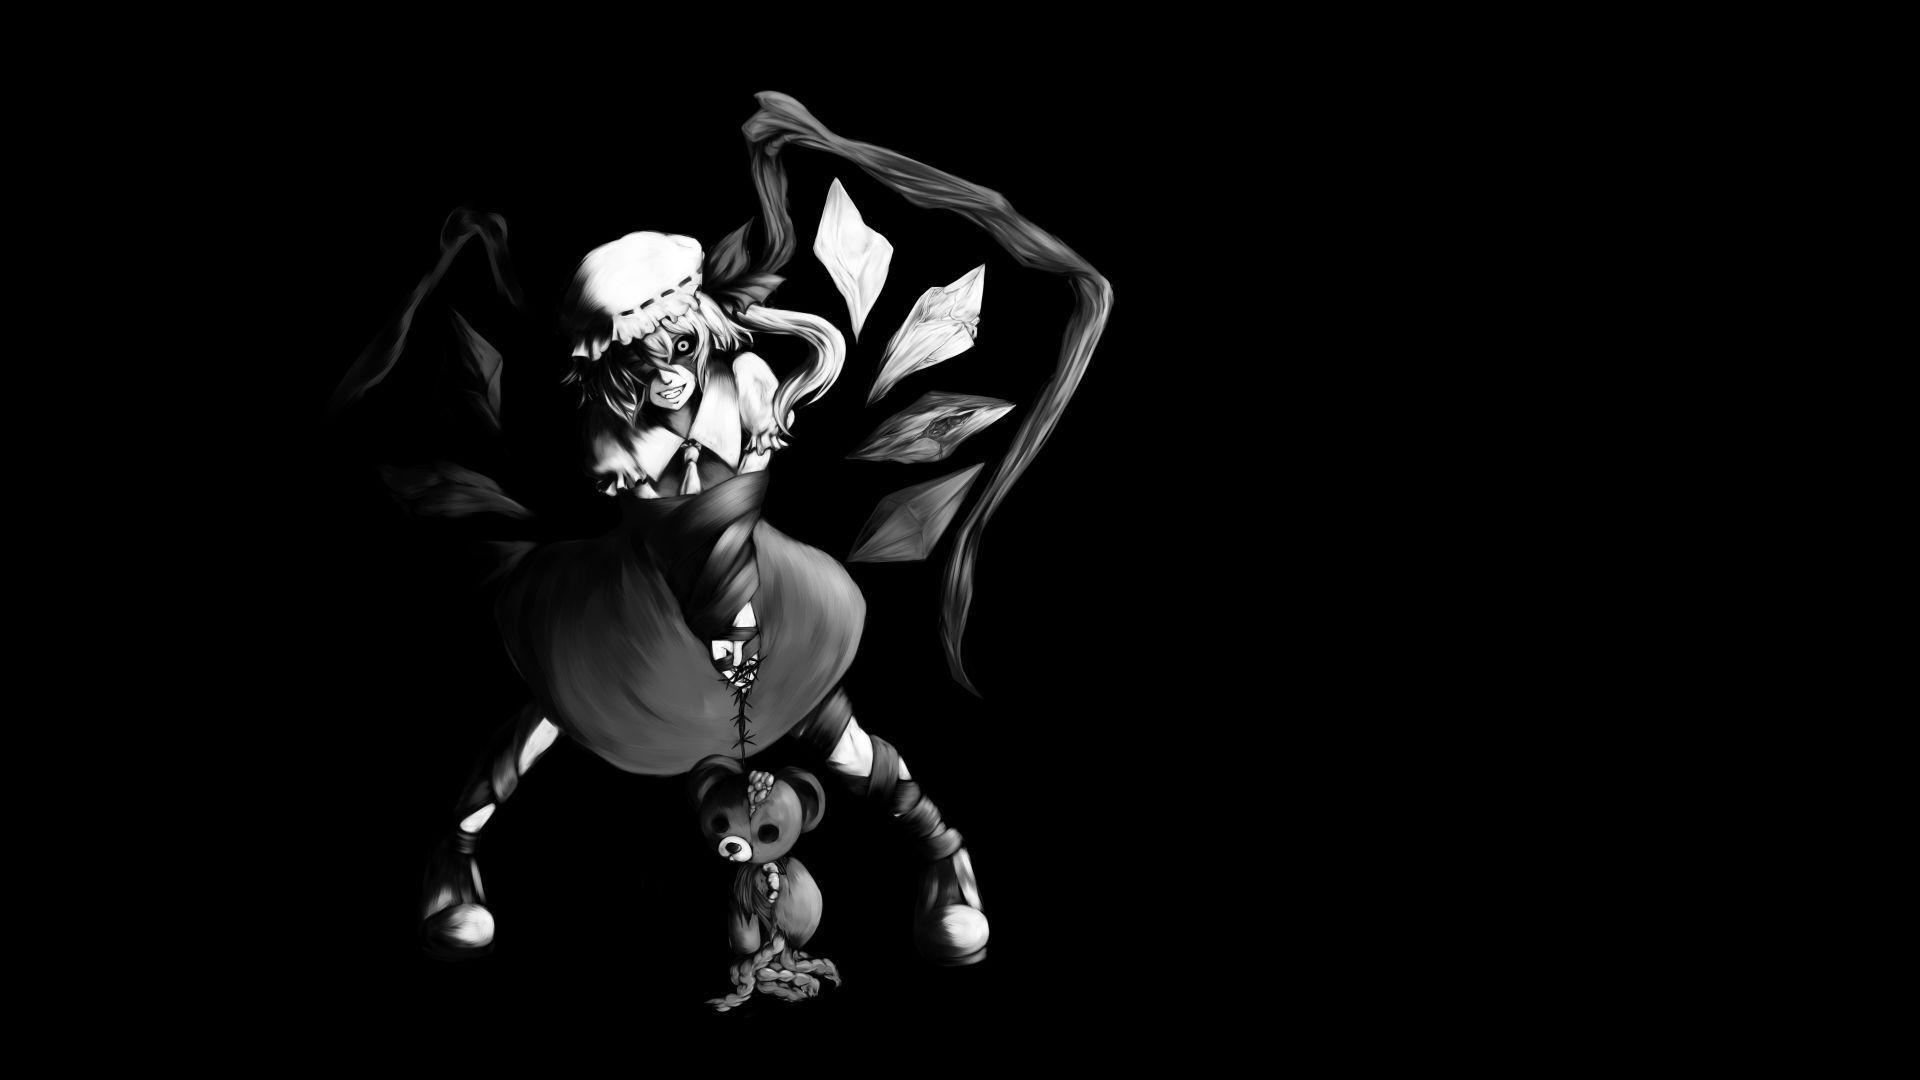 Black anime wallpapers wallpaper cave - Anime wallpaper black background ...